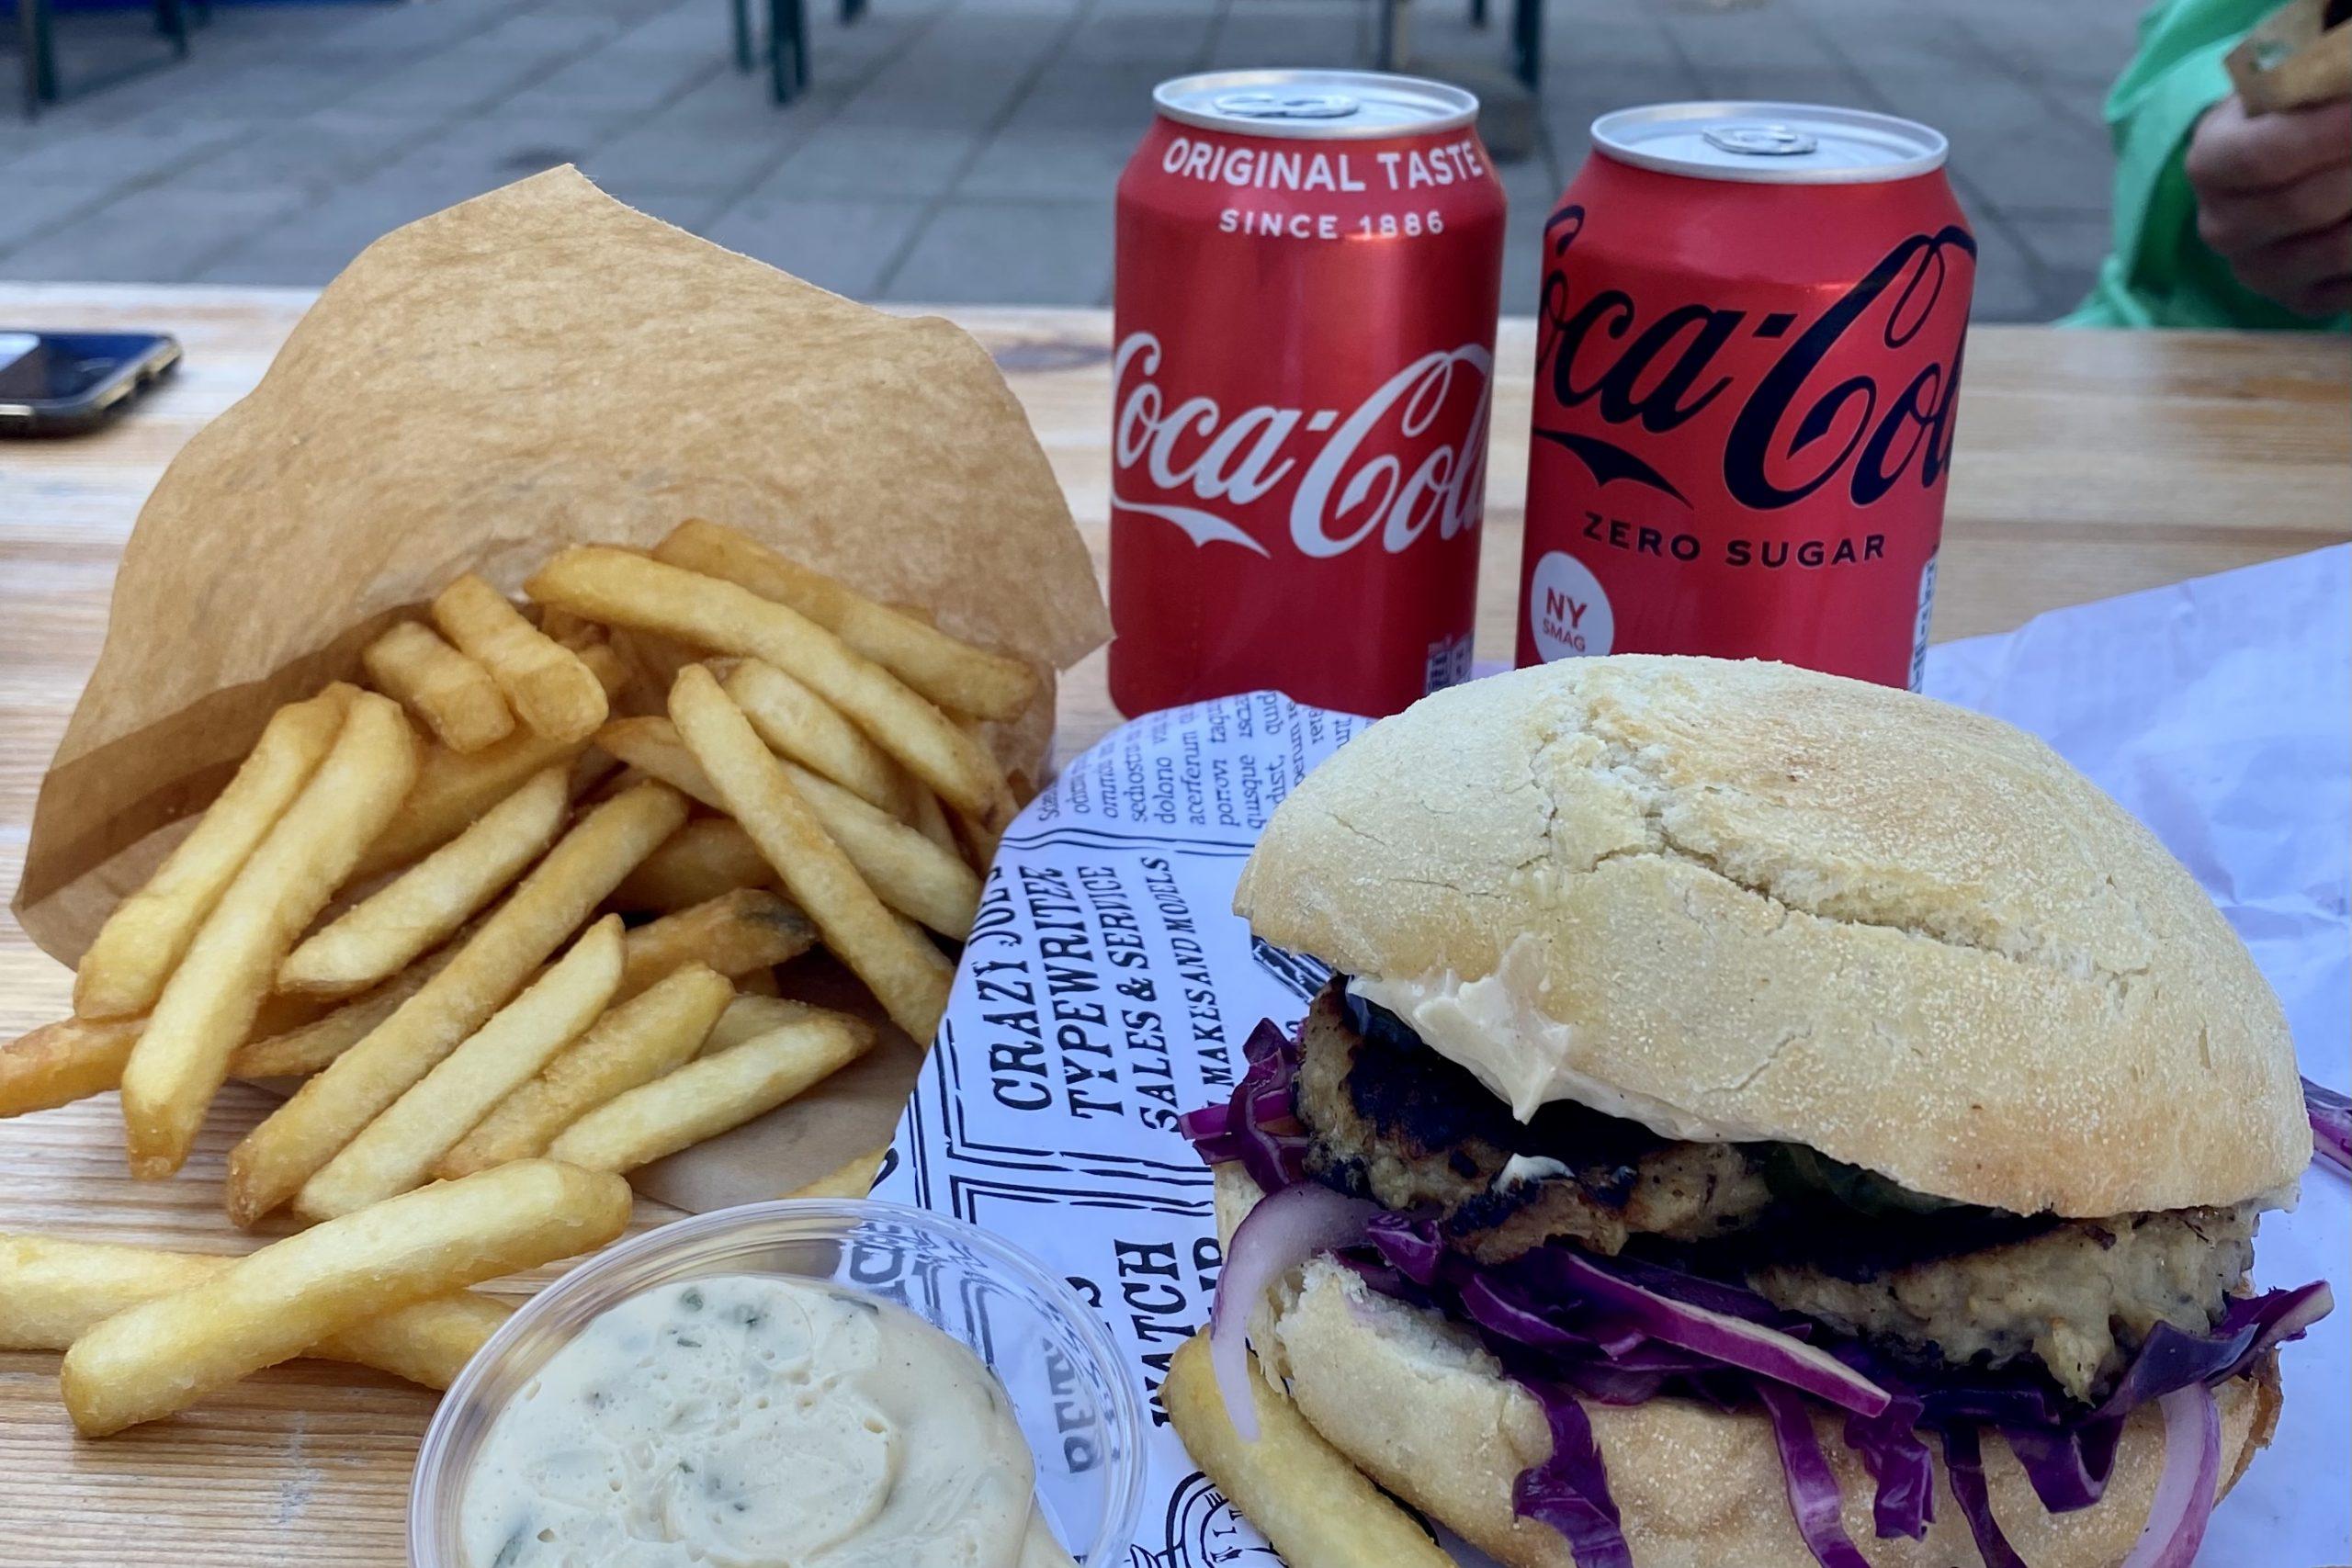 Ridehuset omdannet til Street Food-marked: Det kan du få at spise